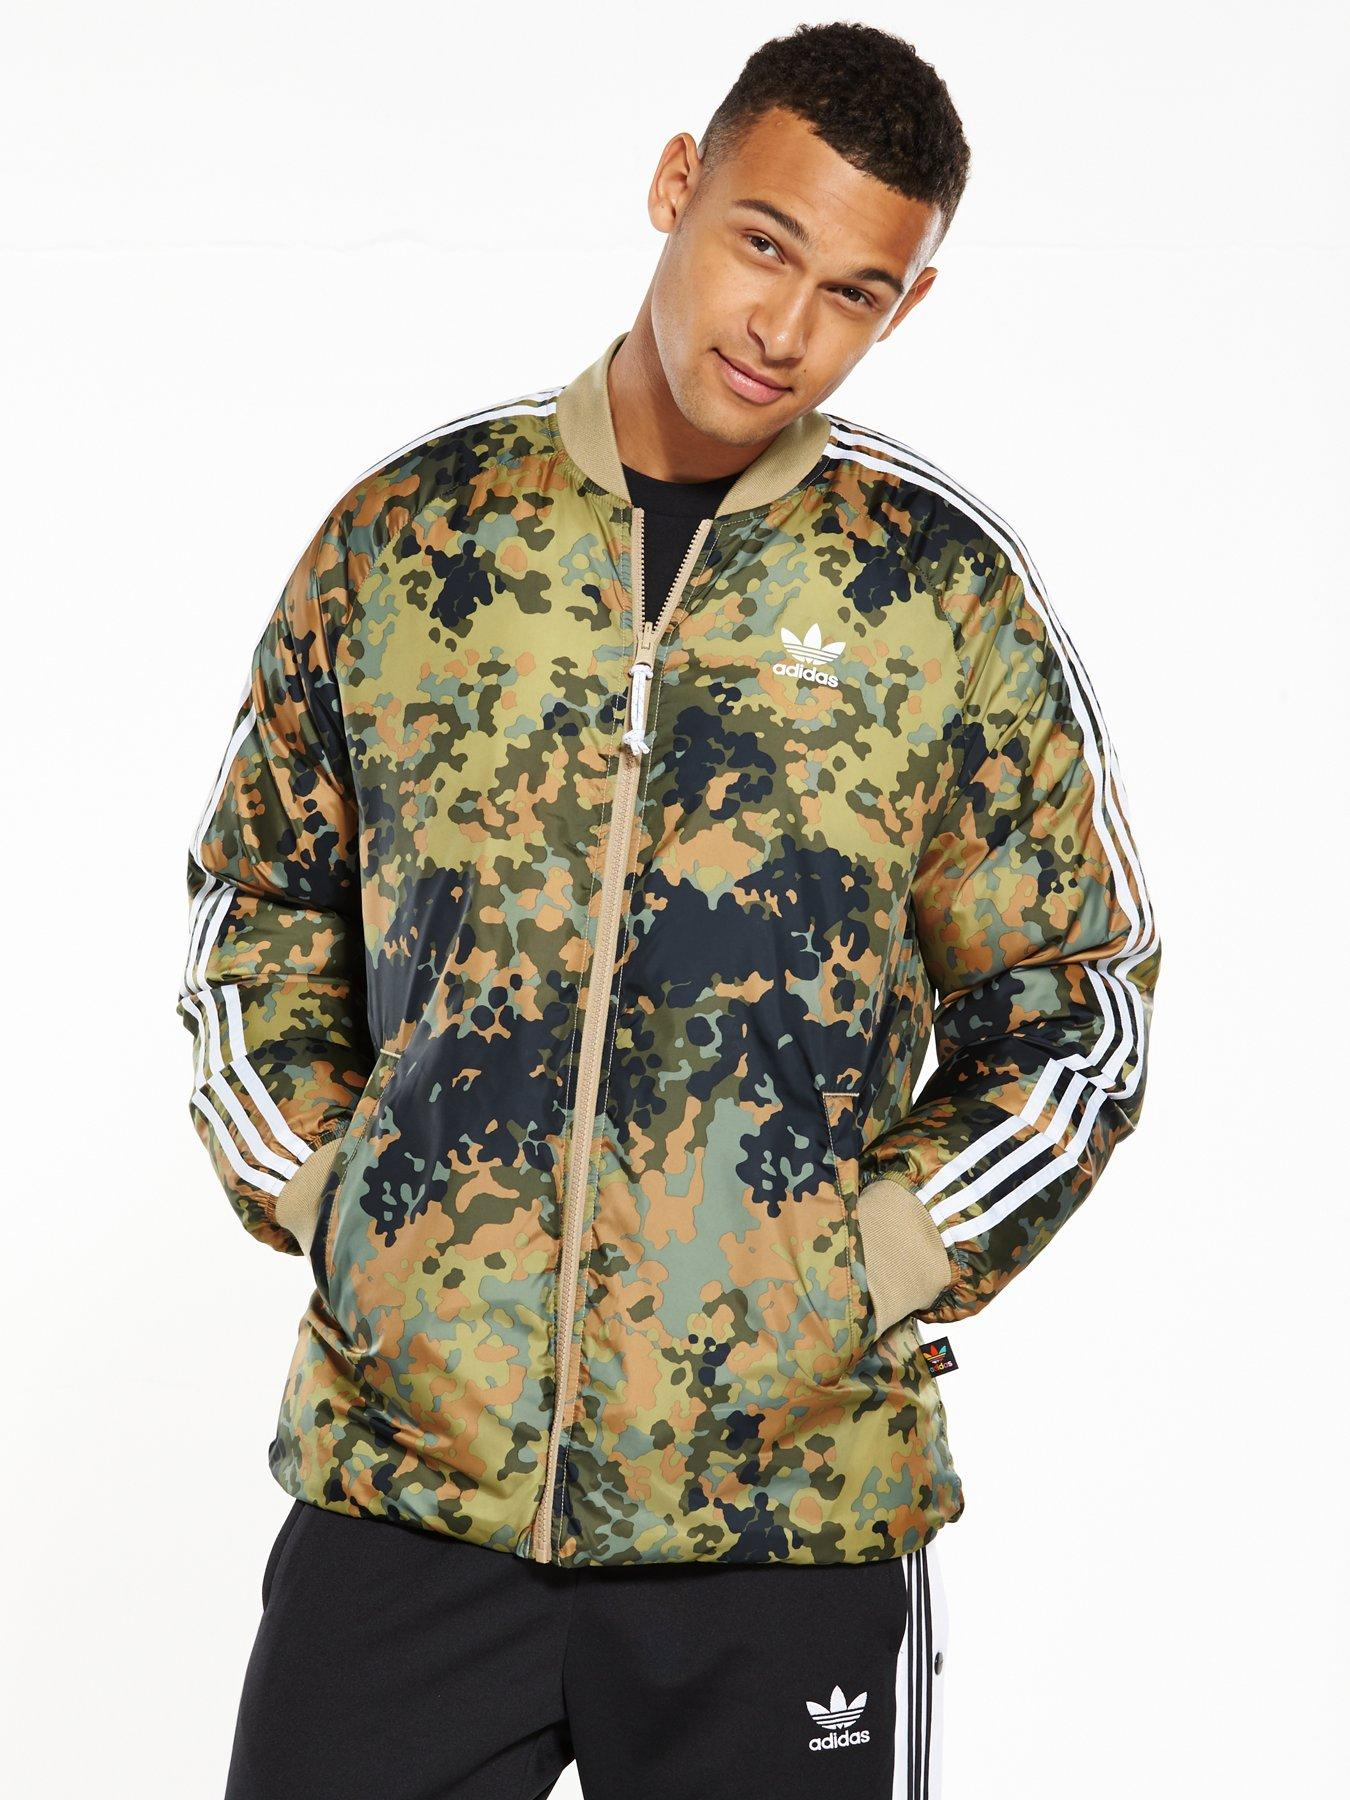 adidas originali x pharrell williams reversibile giacca invernale